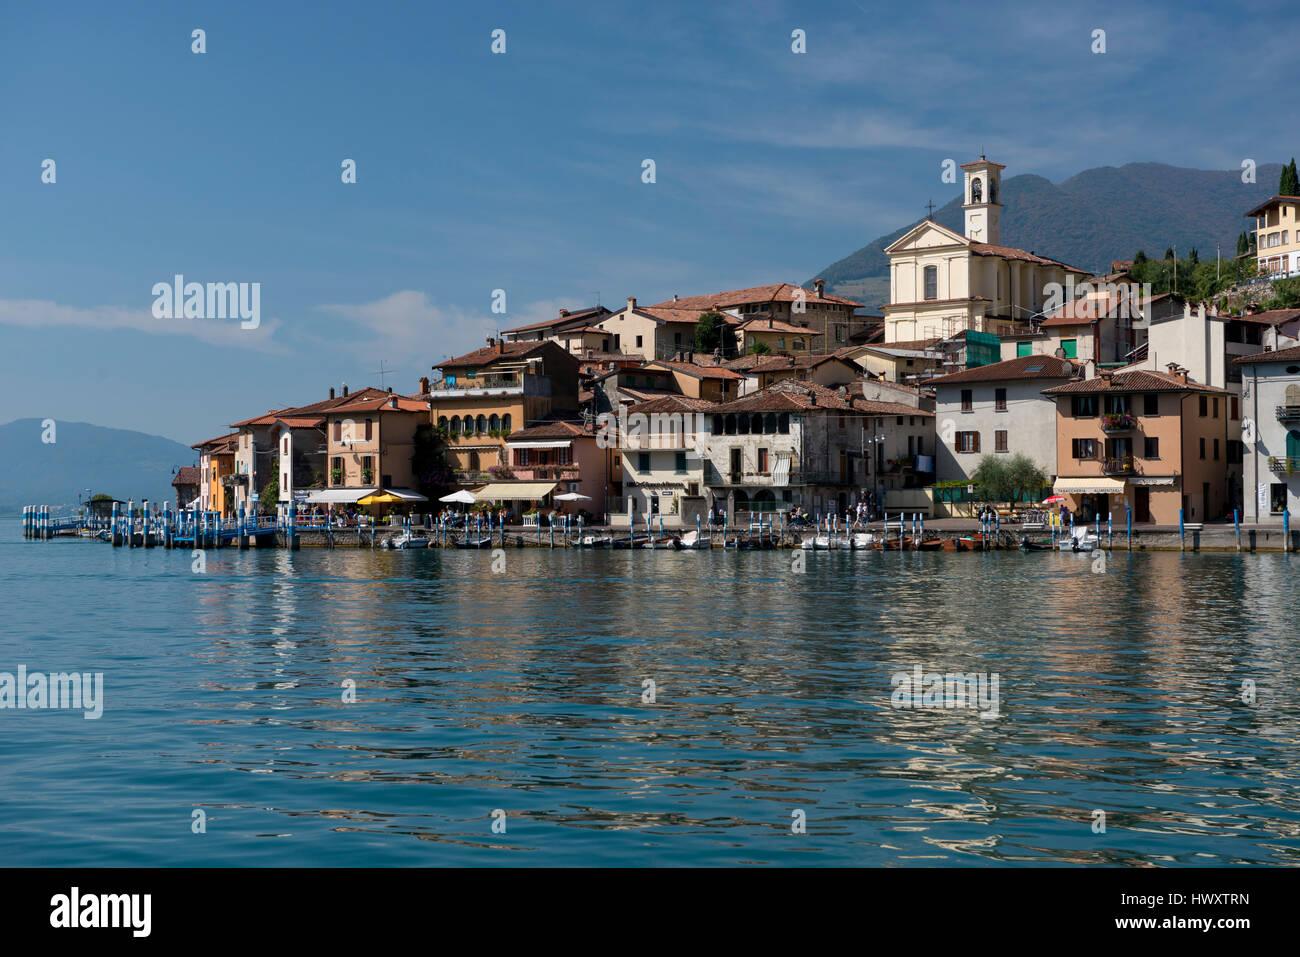 Peschiera Maraglio, village on Montisola, on the Iseo Lake, Italy Stock Photo